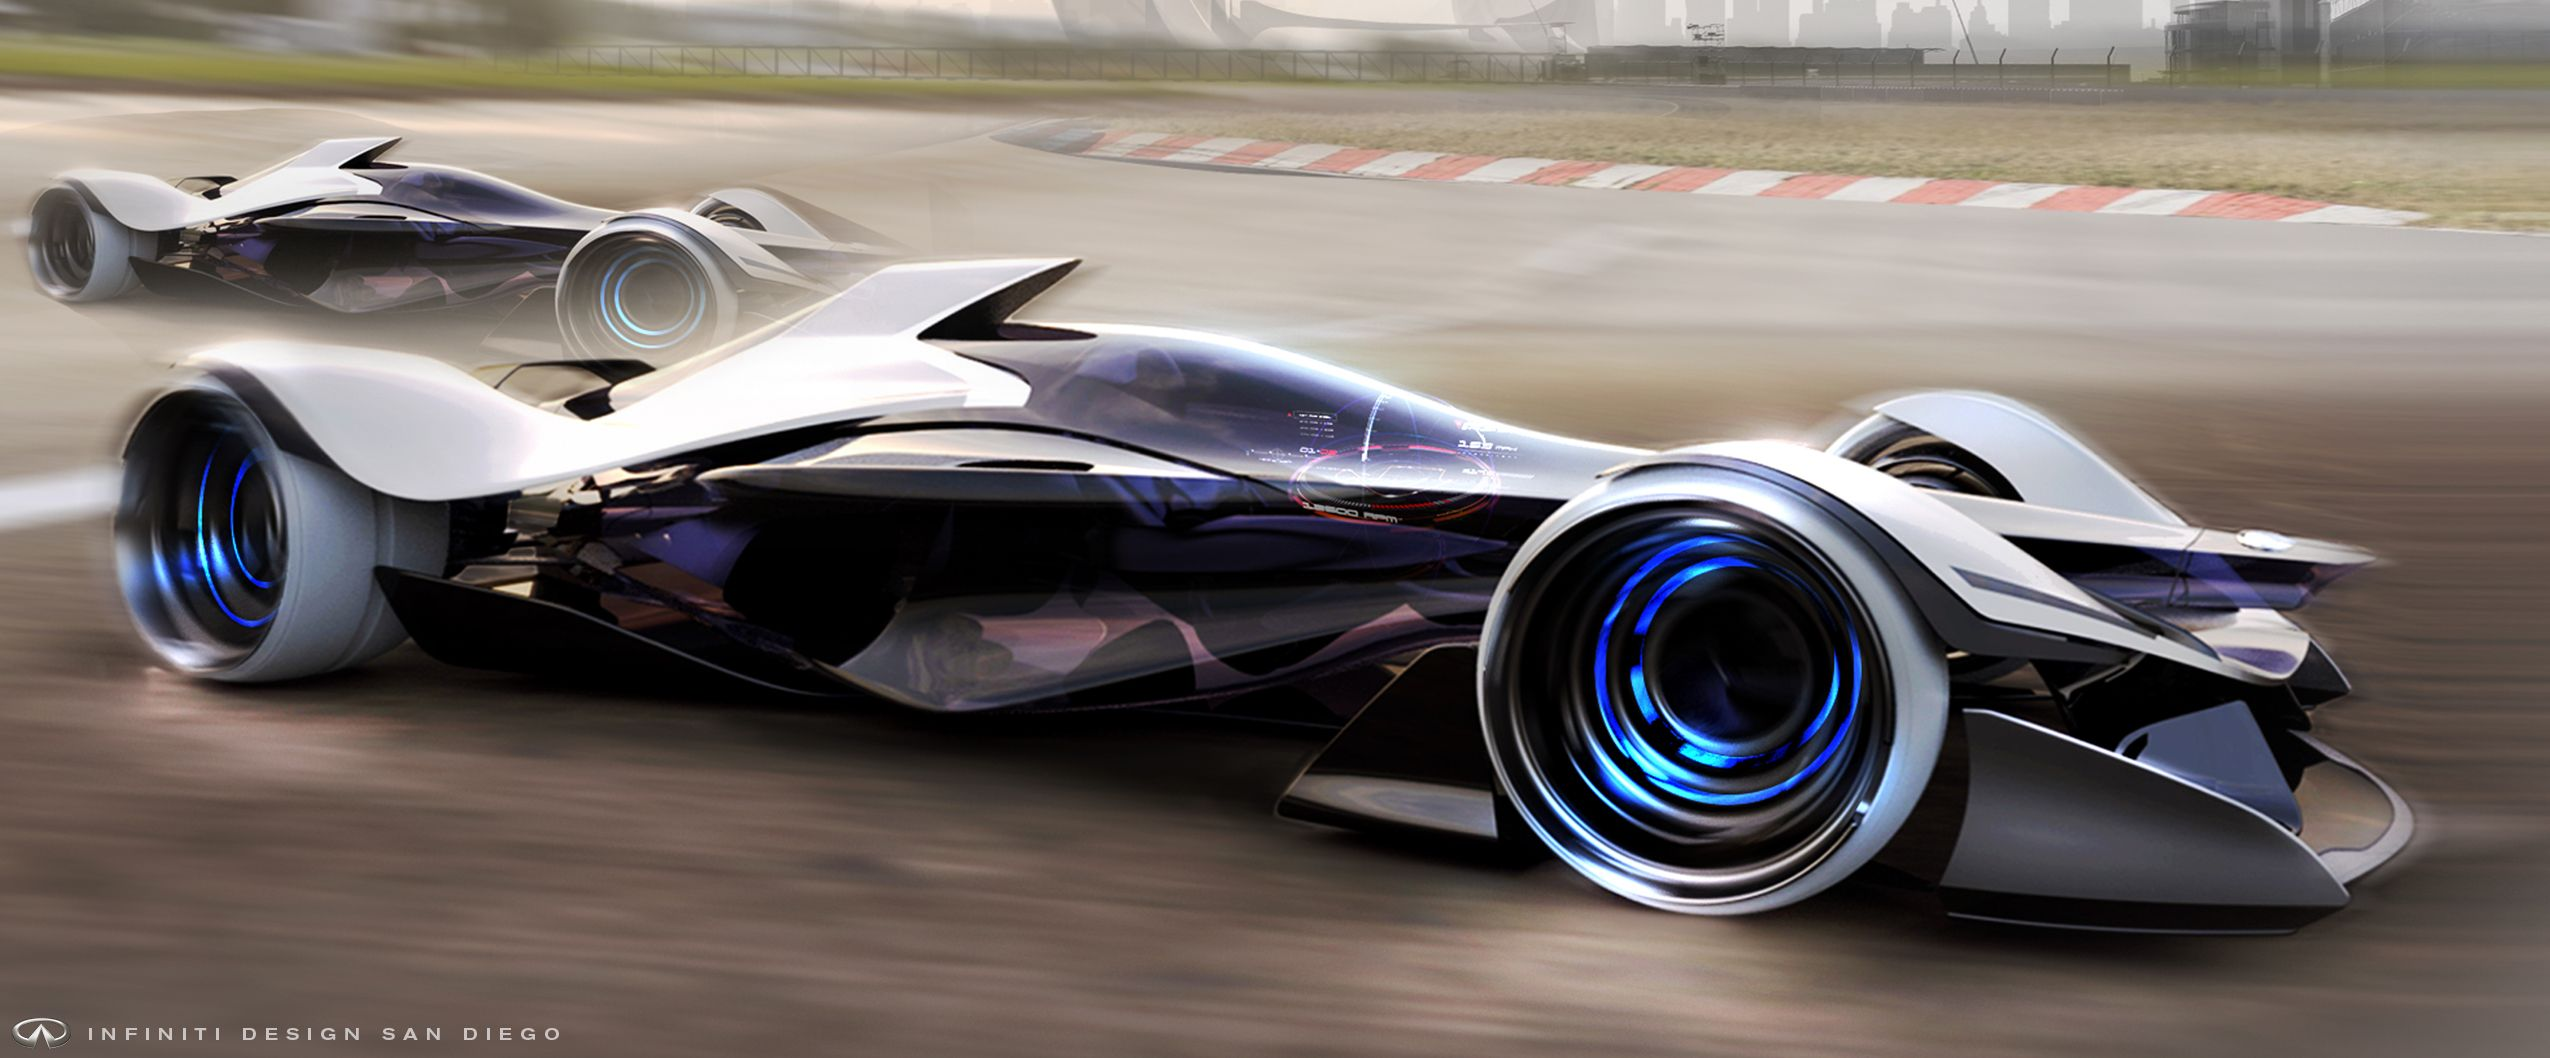 Infiniti San Diego >> Formula 1 Infiniti Design San Diego Presents Infiniti Synaptiq